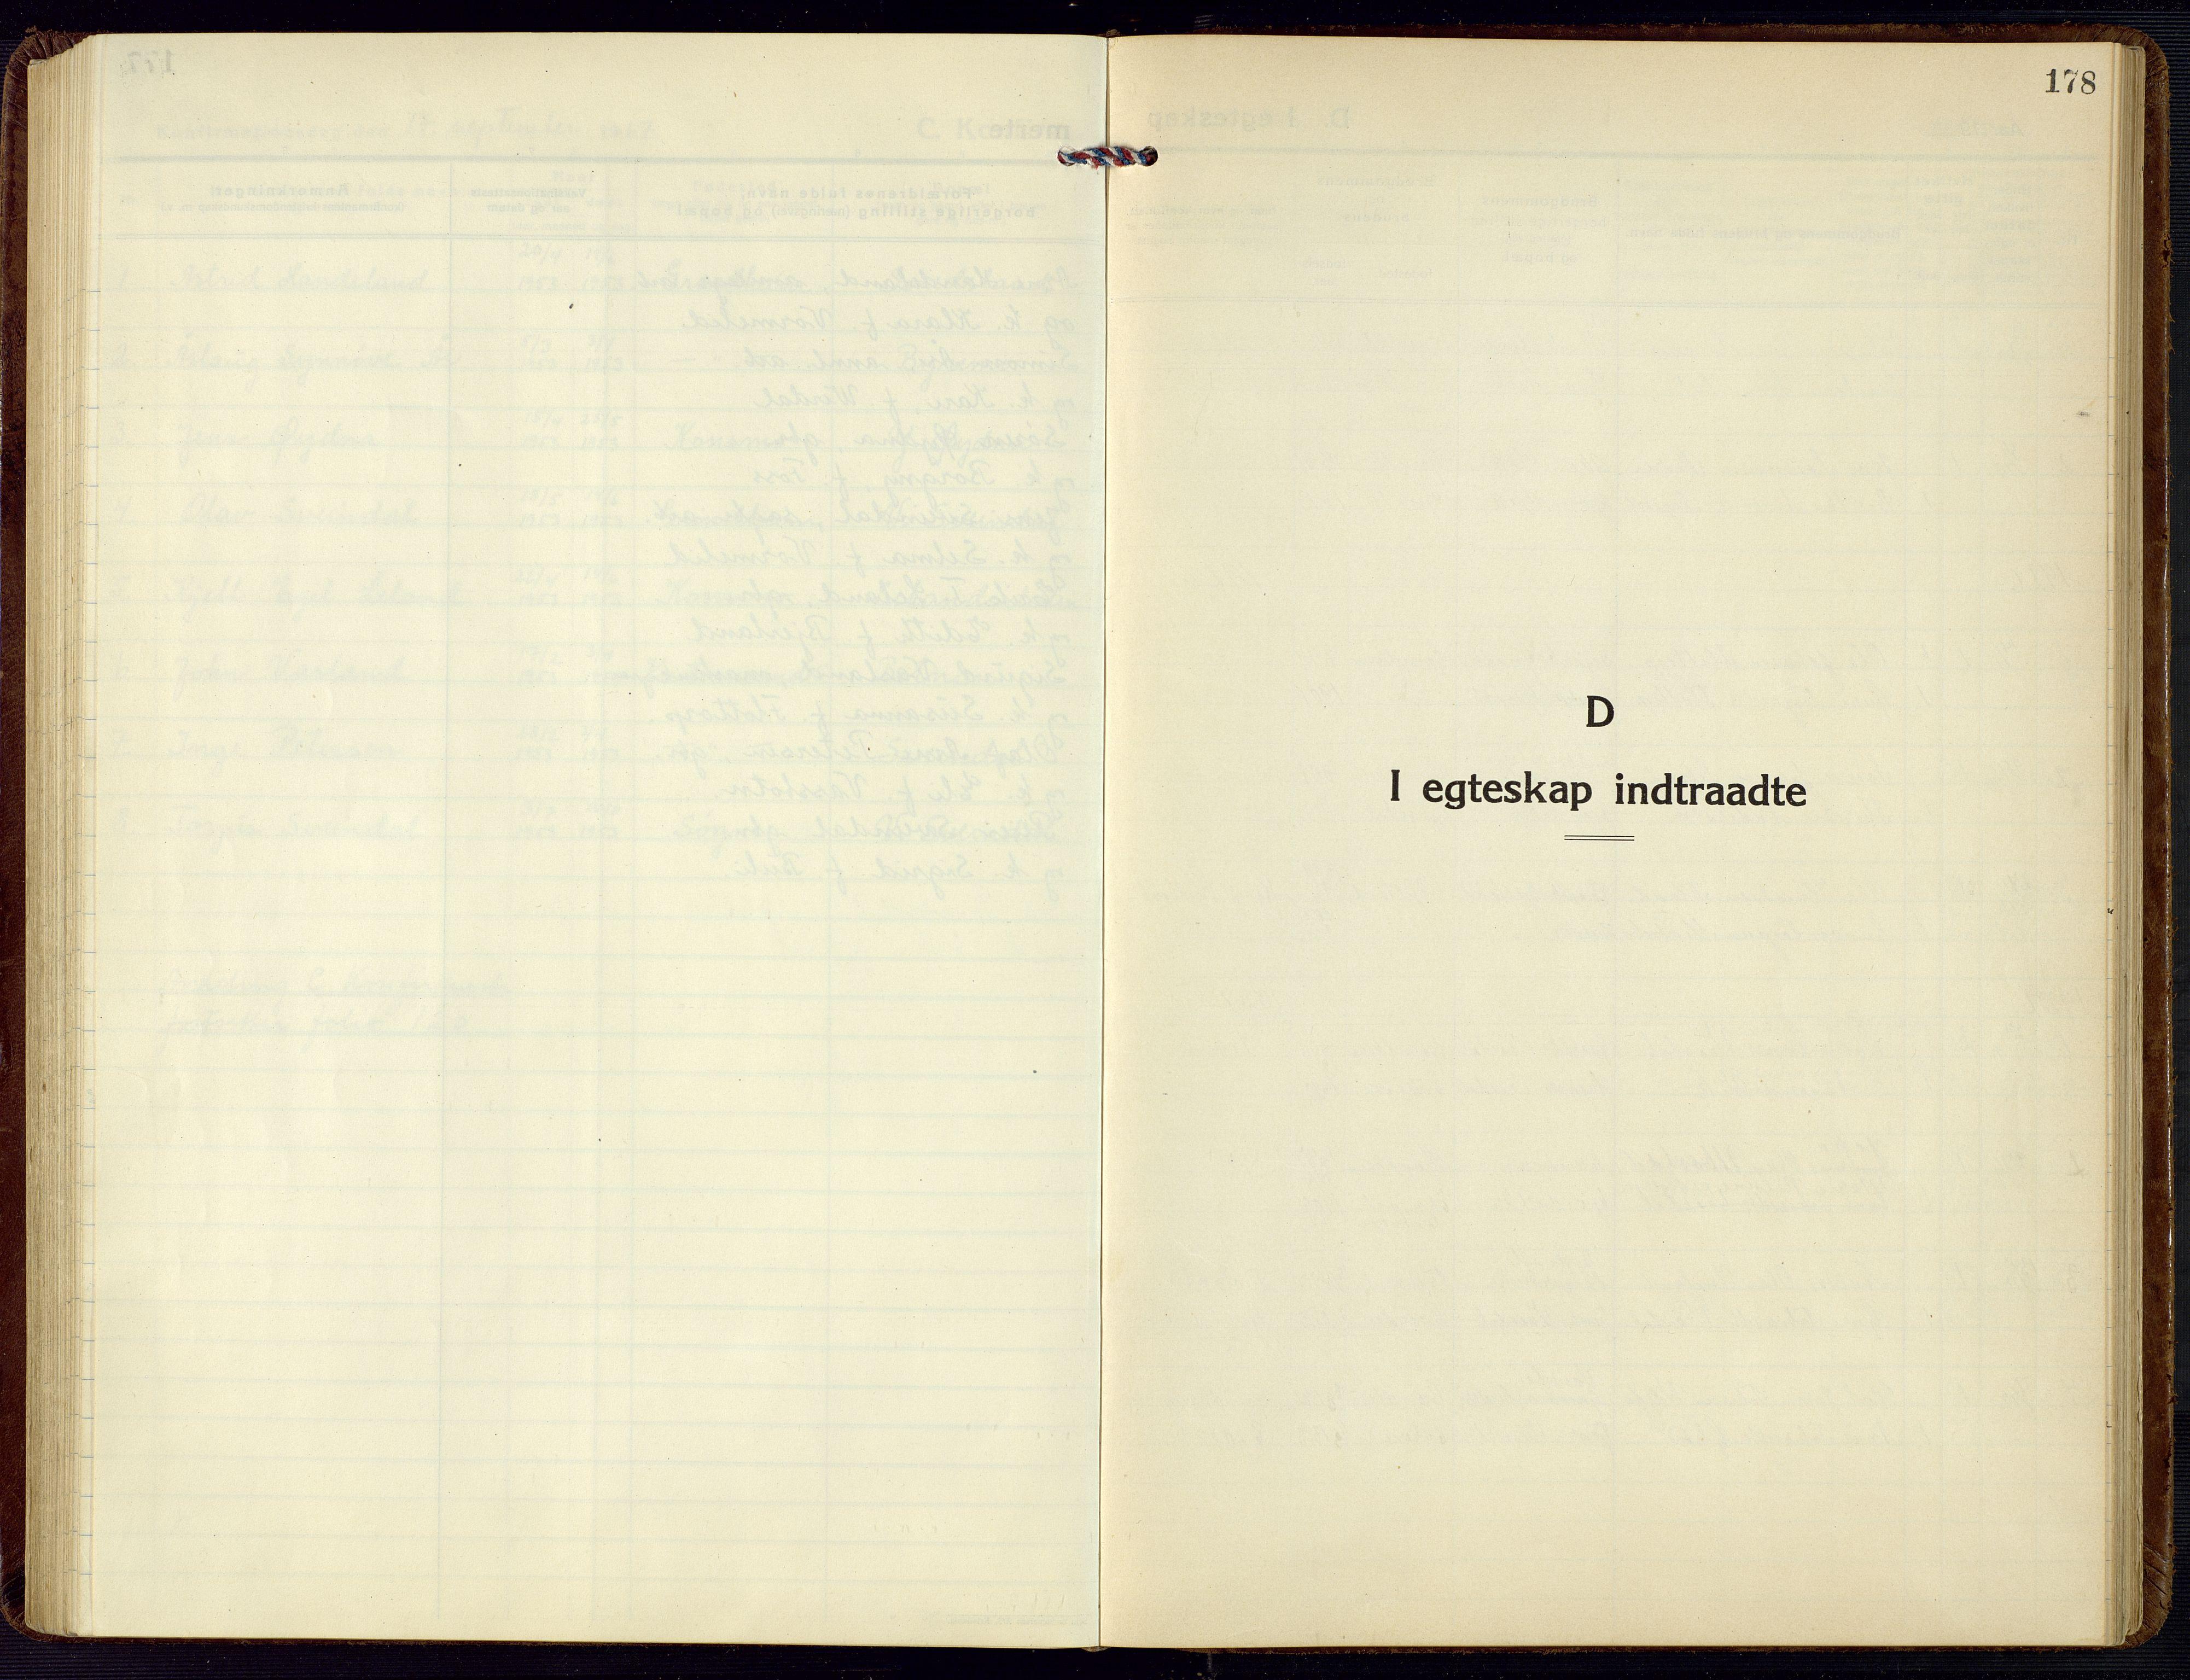 SAK, Bjelland sokneprestkontor, F/Fb/Fbc/L0004: Klokkerbok nr. B 4, 1921-1978, s. 178